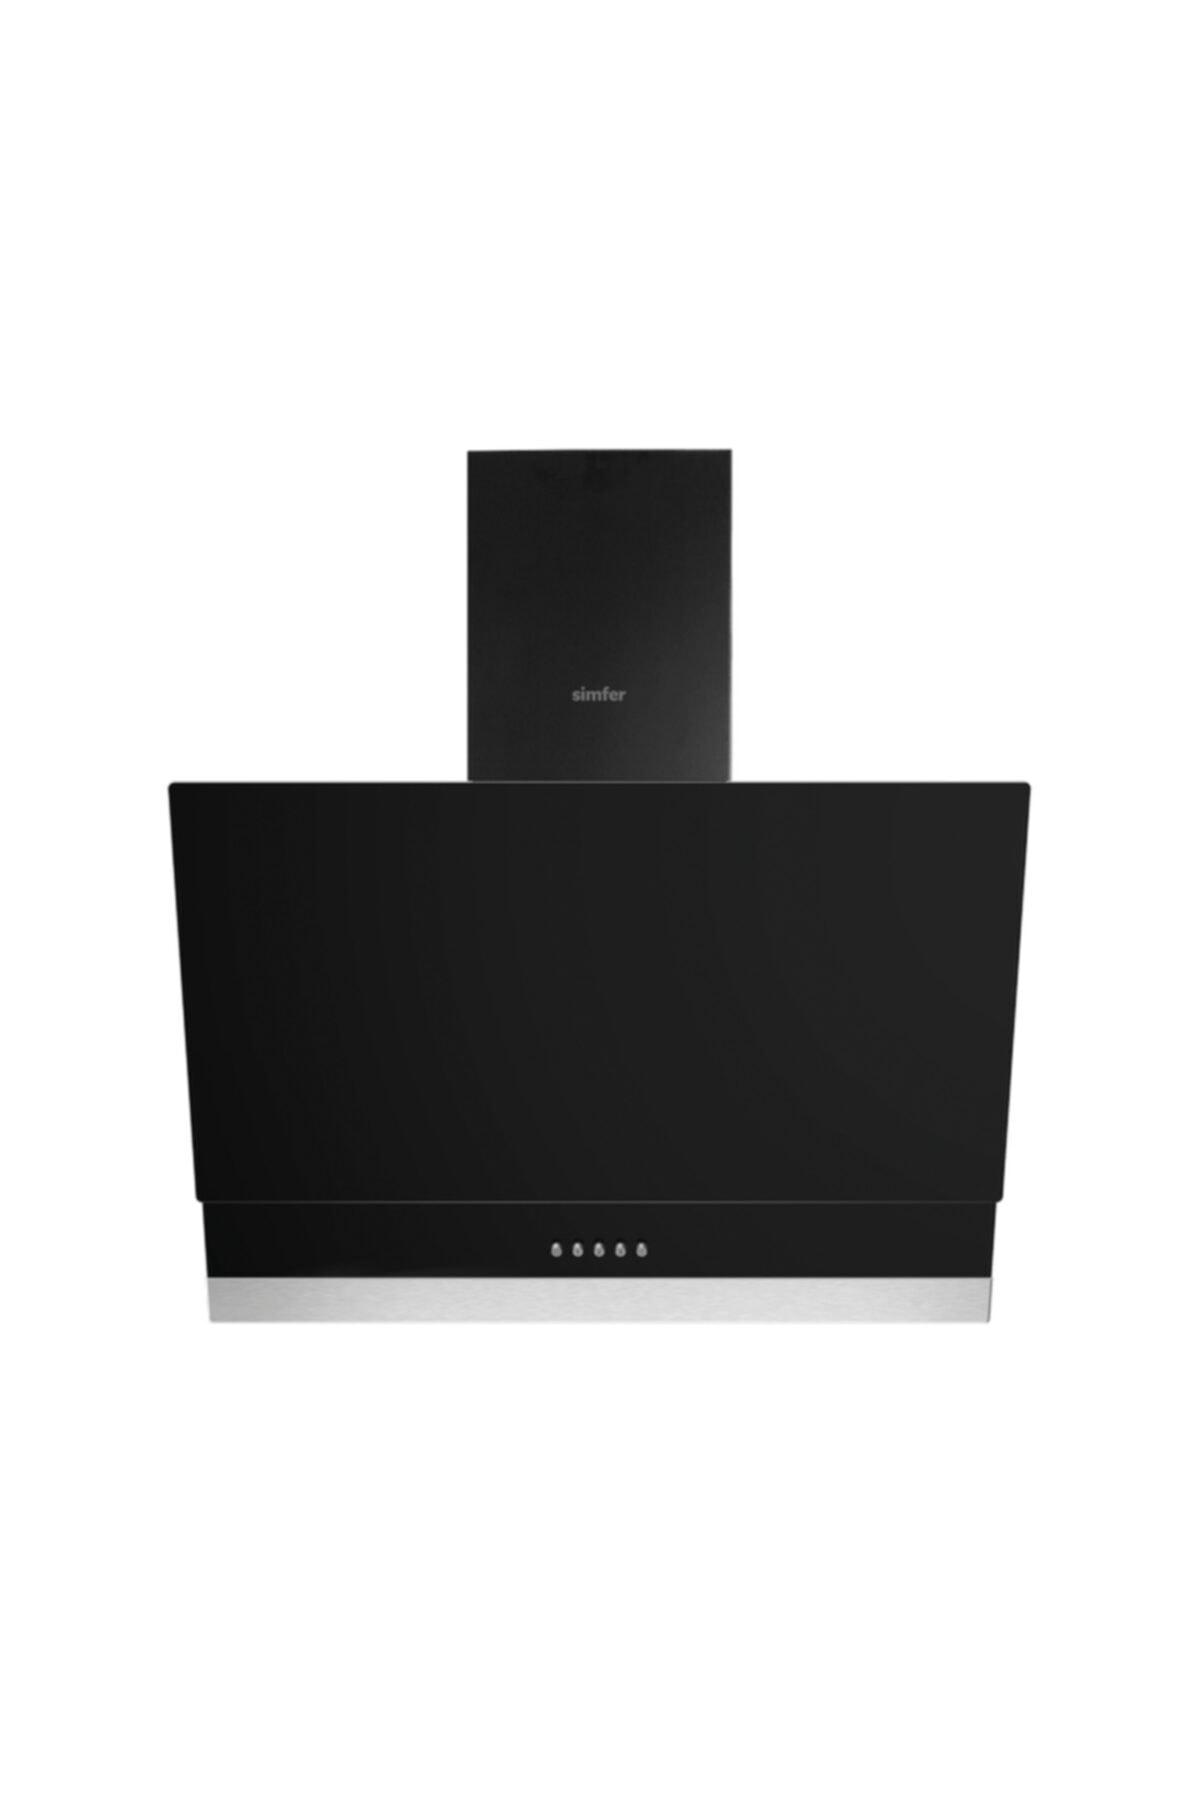 Simfer 9603 60 Cm Siyah Eğik Cam Push Buton Davlumbaz 1